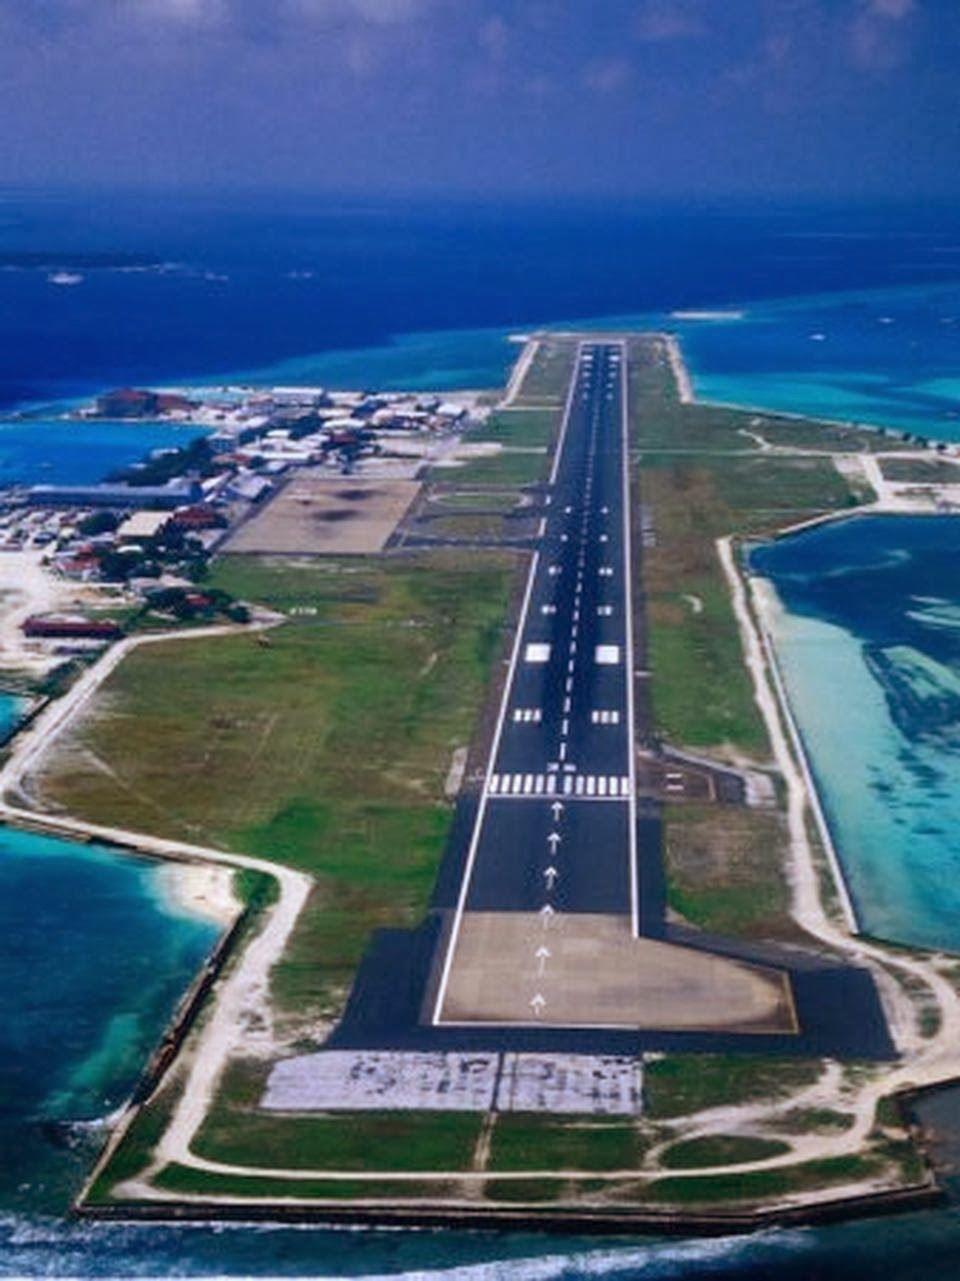 international #maldives #ibrahim #airport #nasir #theIbrahim Nasir International  Airport, The Maldi…   Visit maldives, Maldives destinations, International  airport